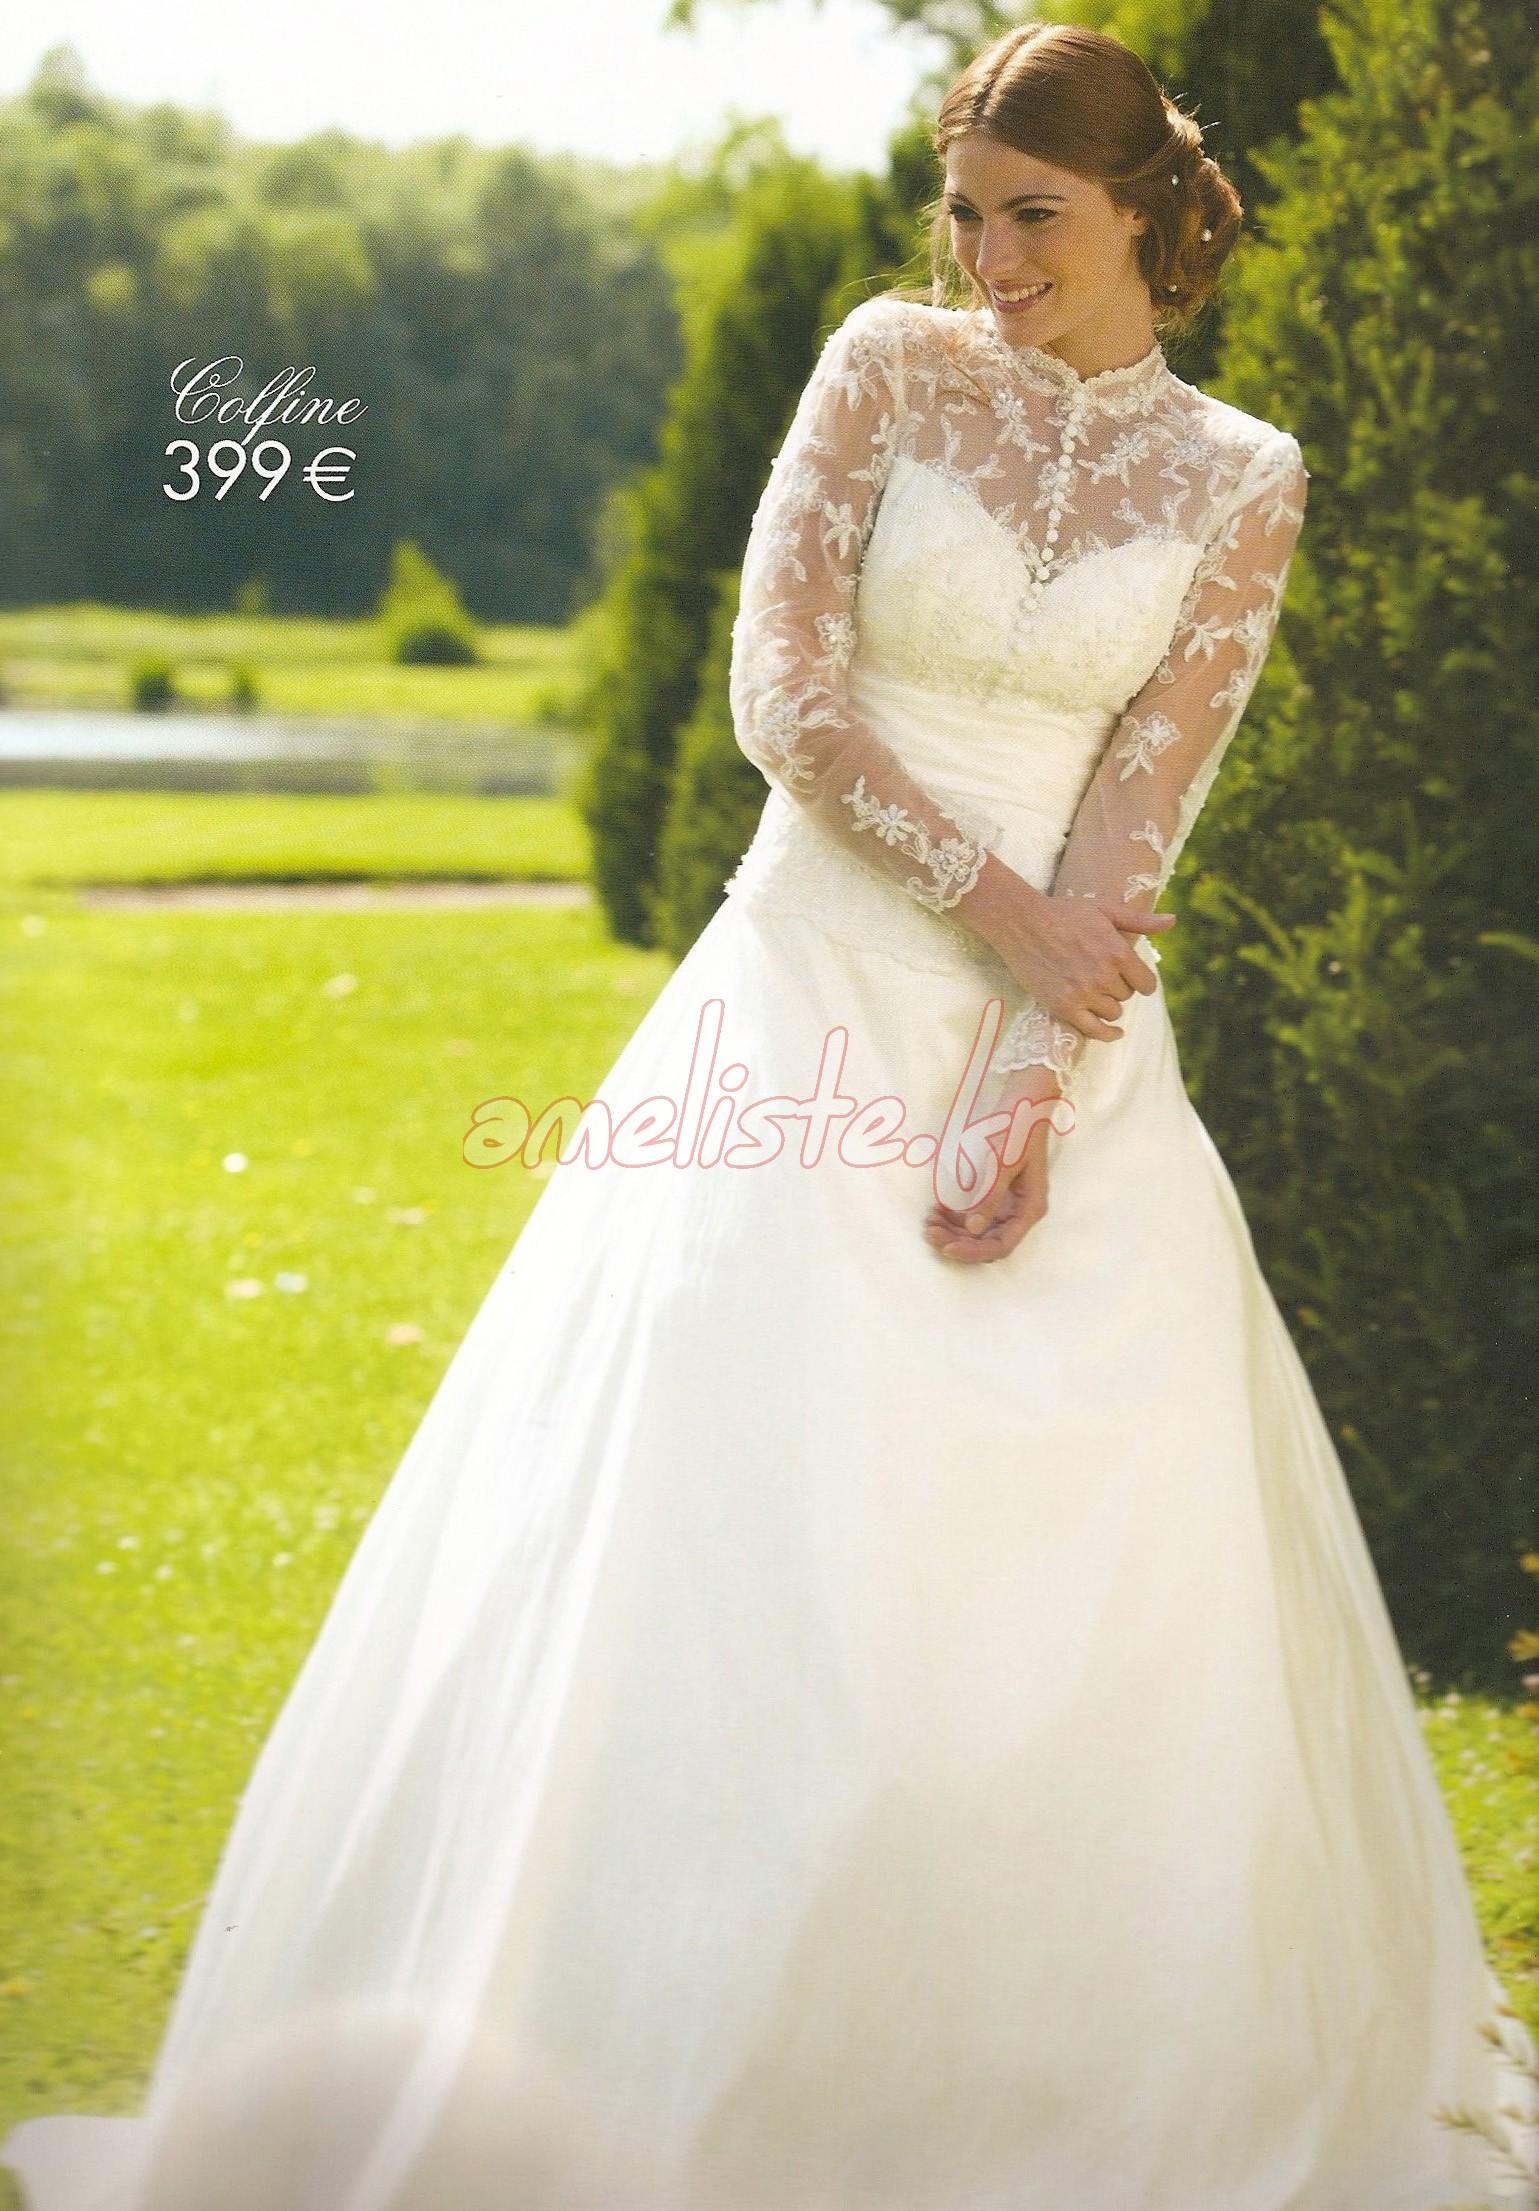 ecfbed1c080 Catalogue mariage - Le mariage